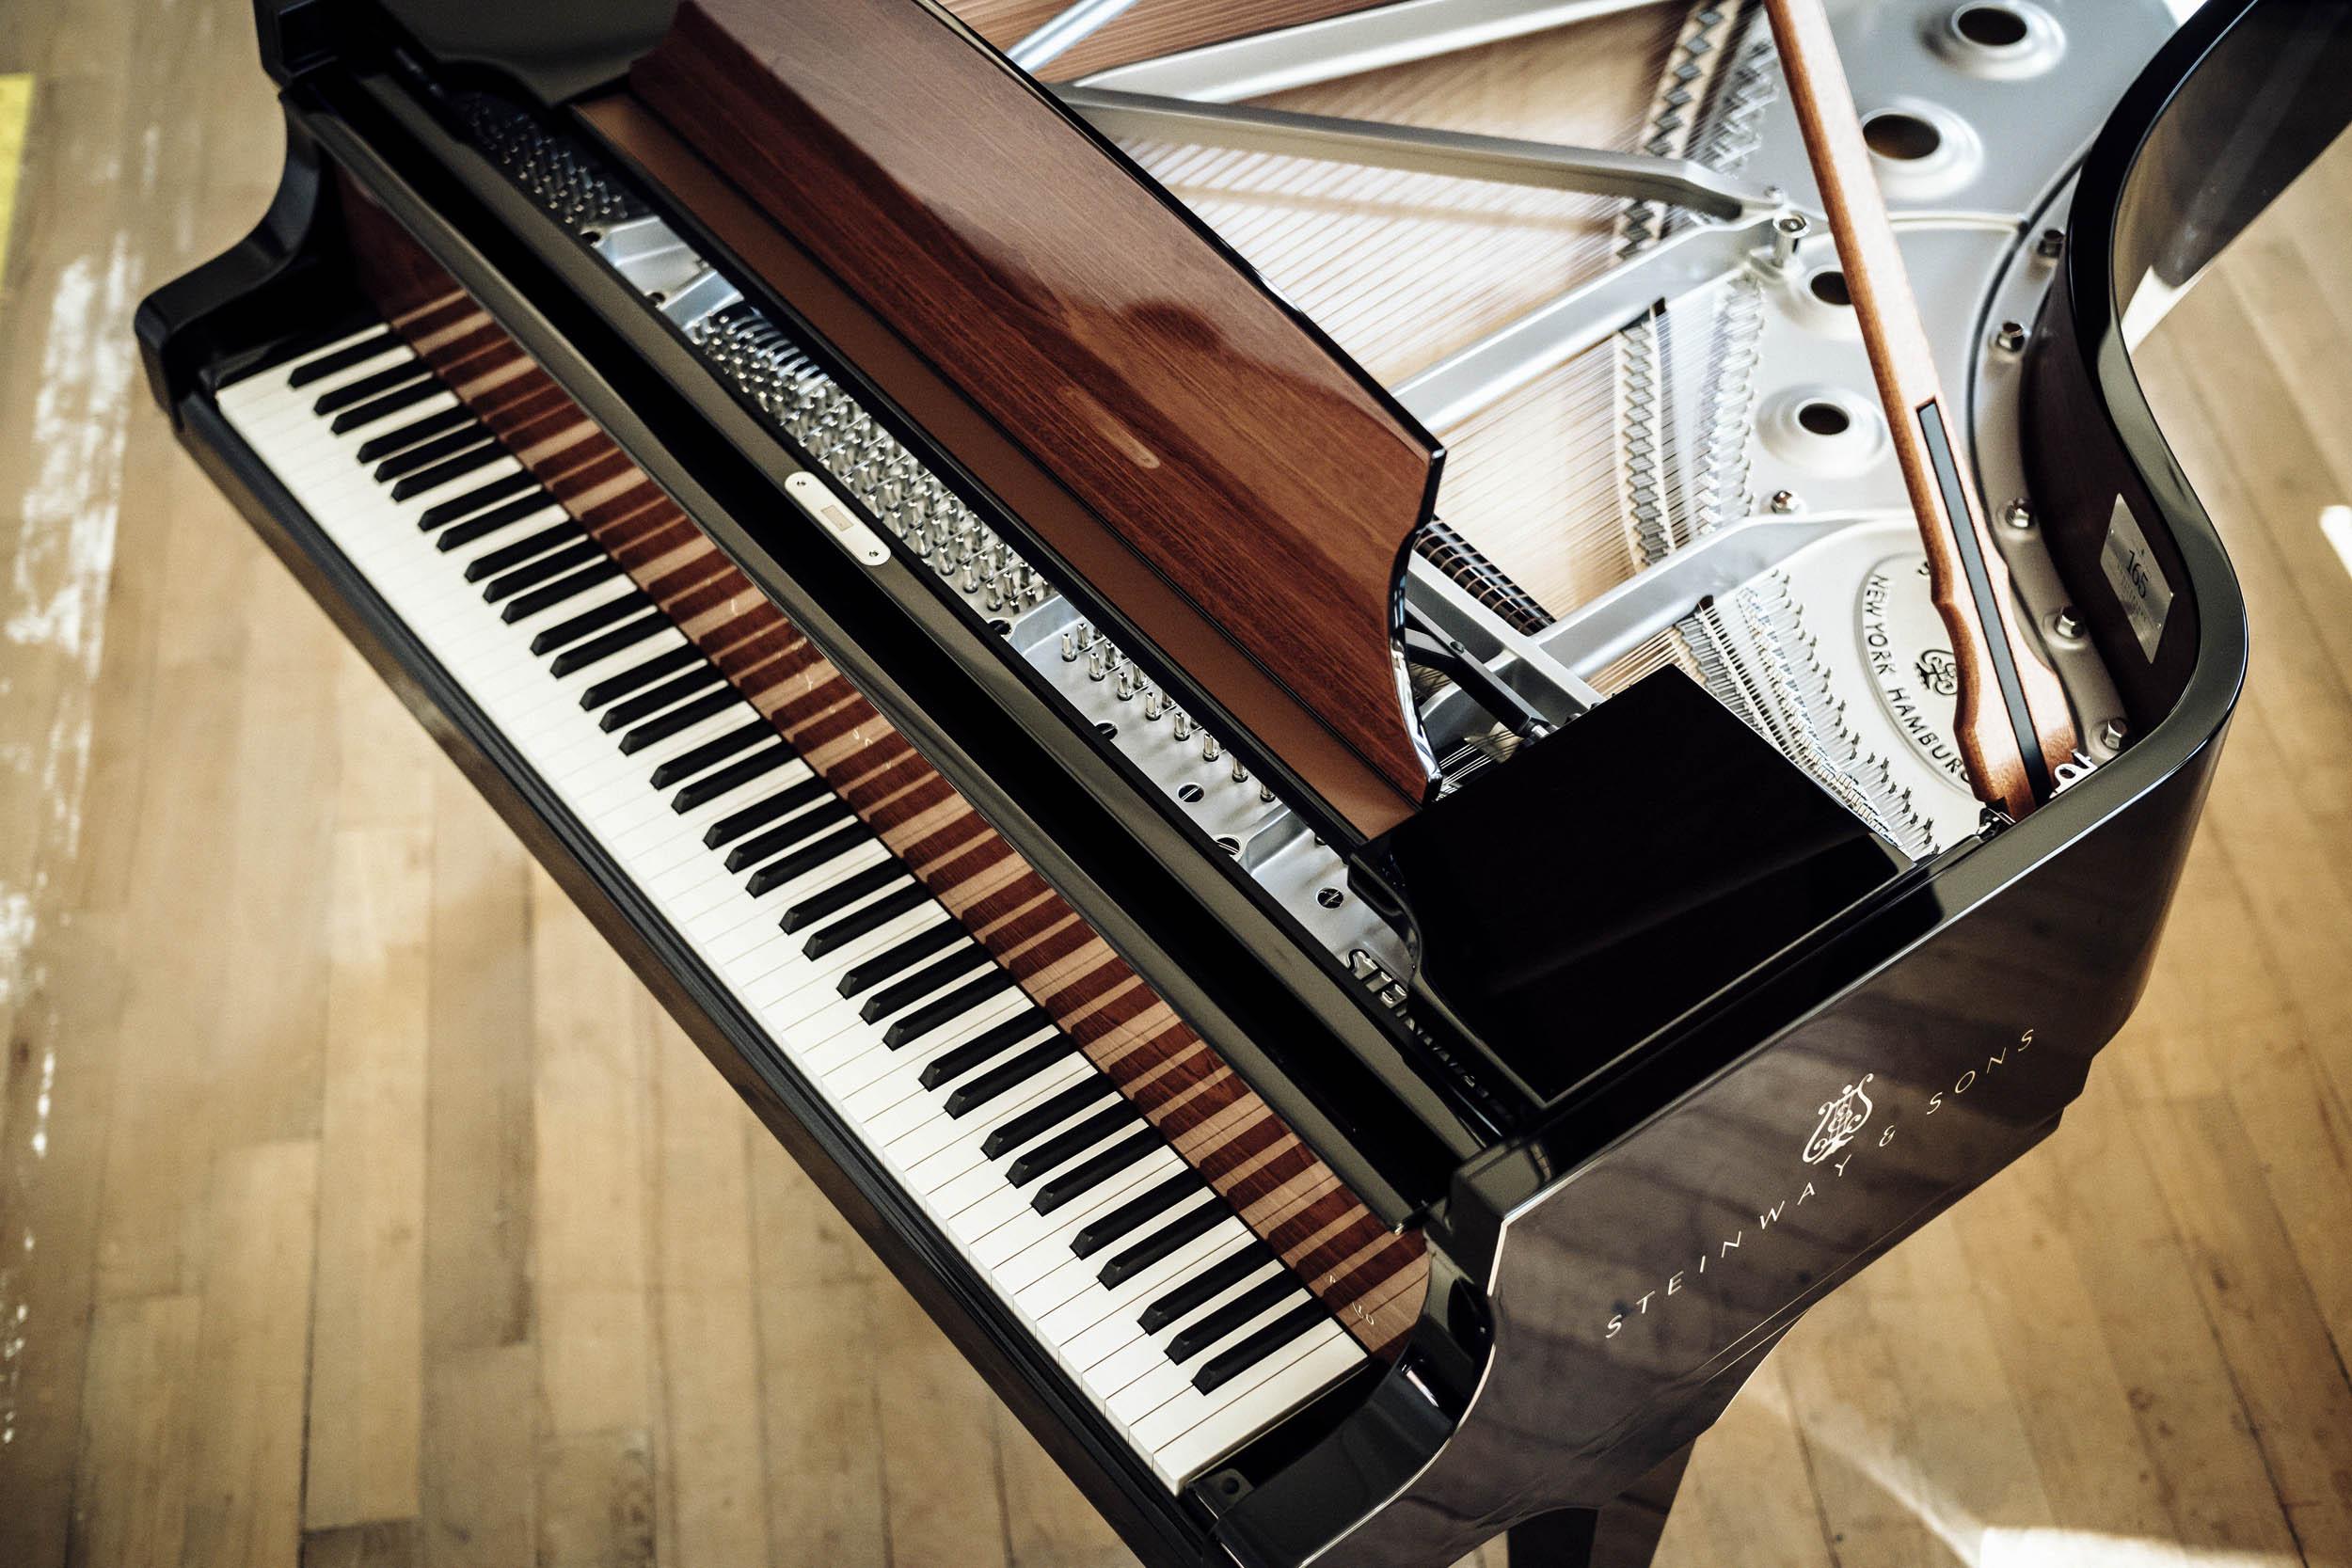 2019-SeifertUebler-steinway-piano-014.jpg